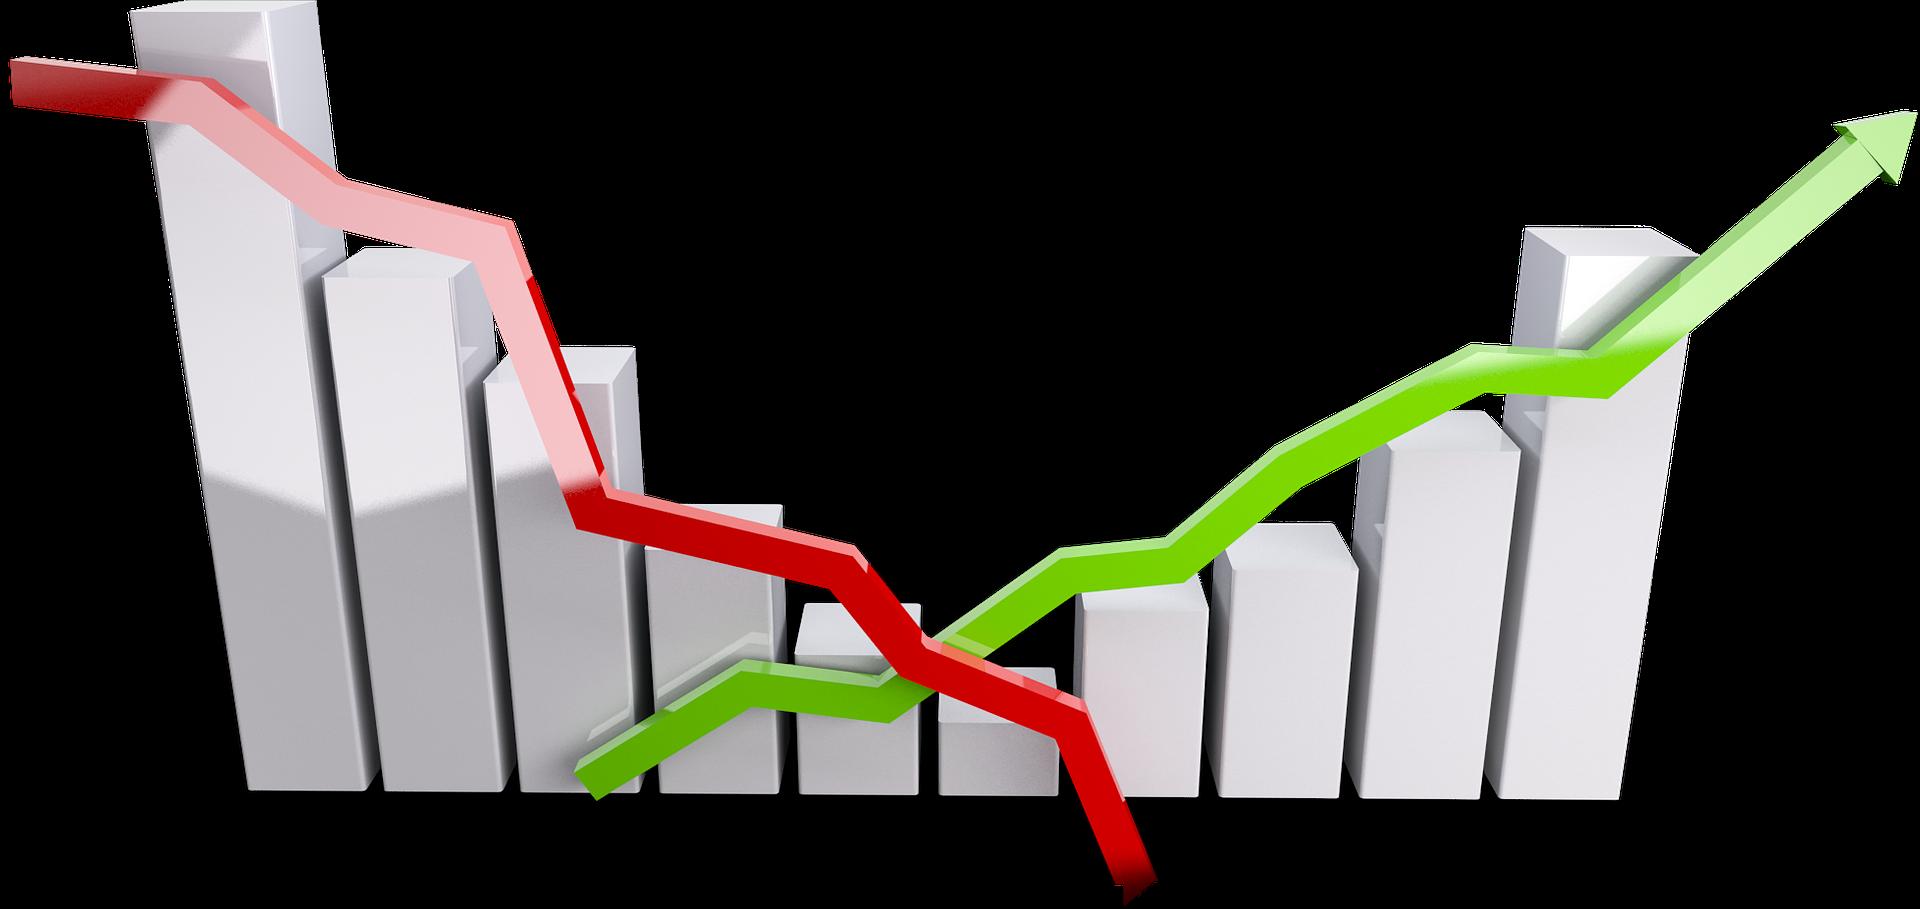 Dow - Stock Market